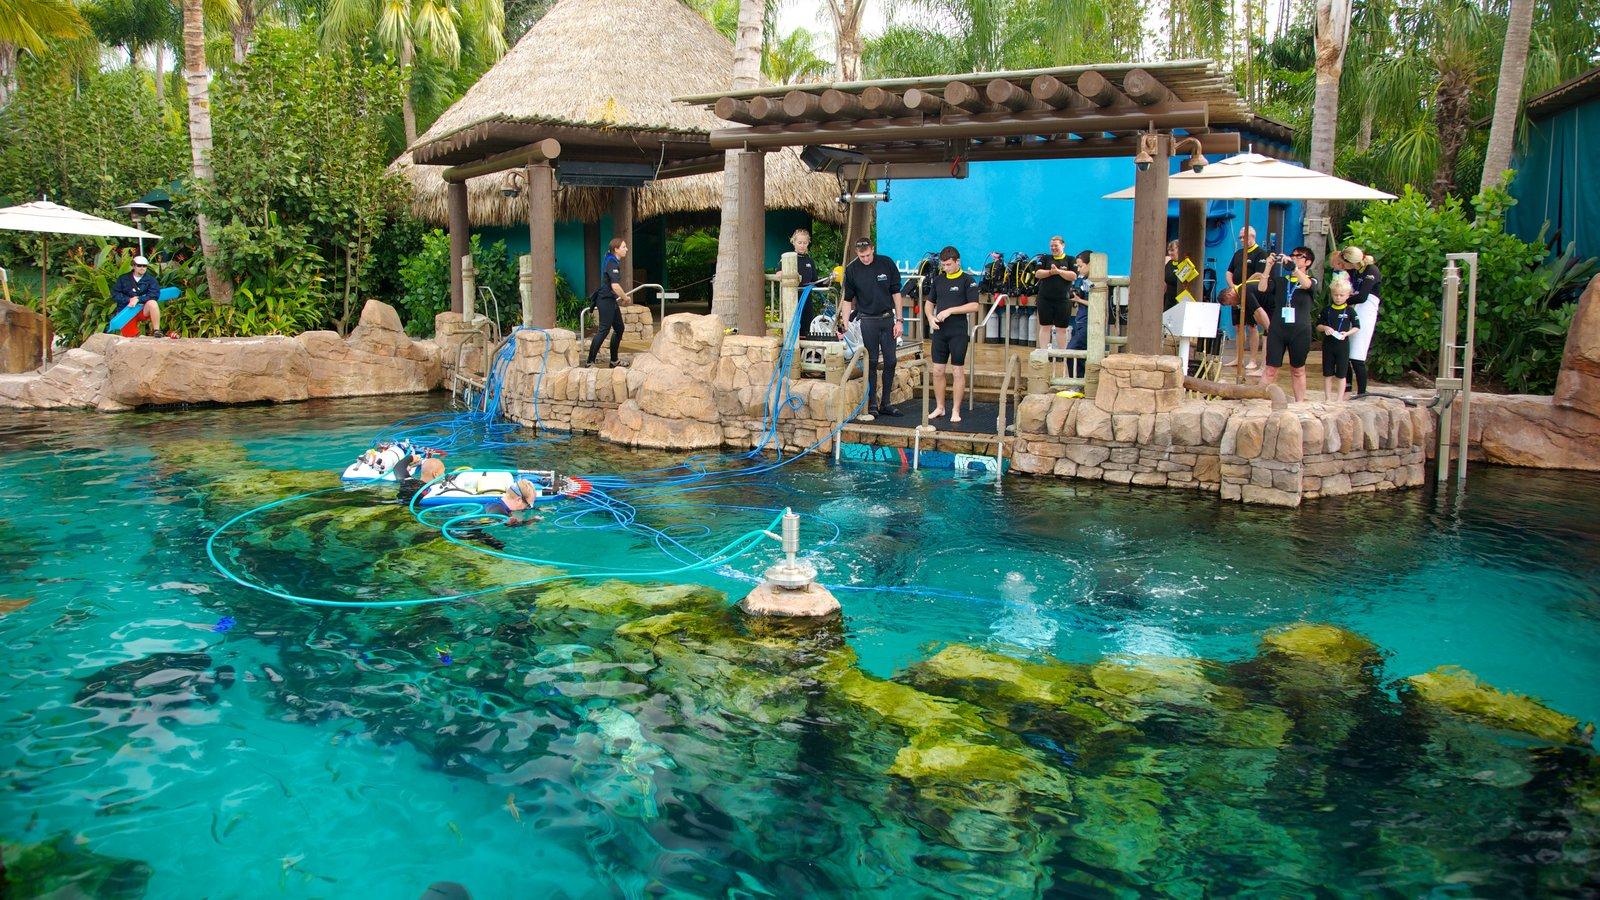 SeaWorld Orlando featuring rides